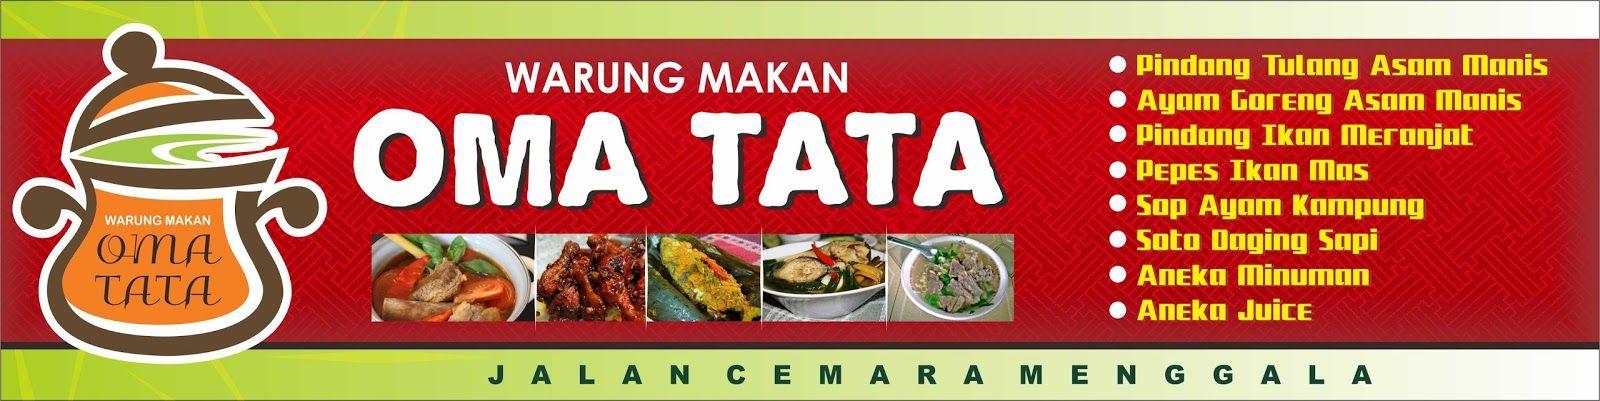 Background Banner Warung Makan Hd - desain spanduk keren